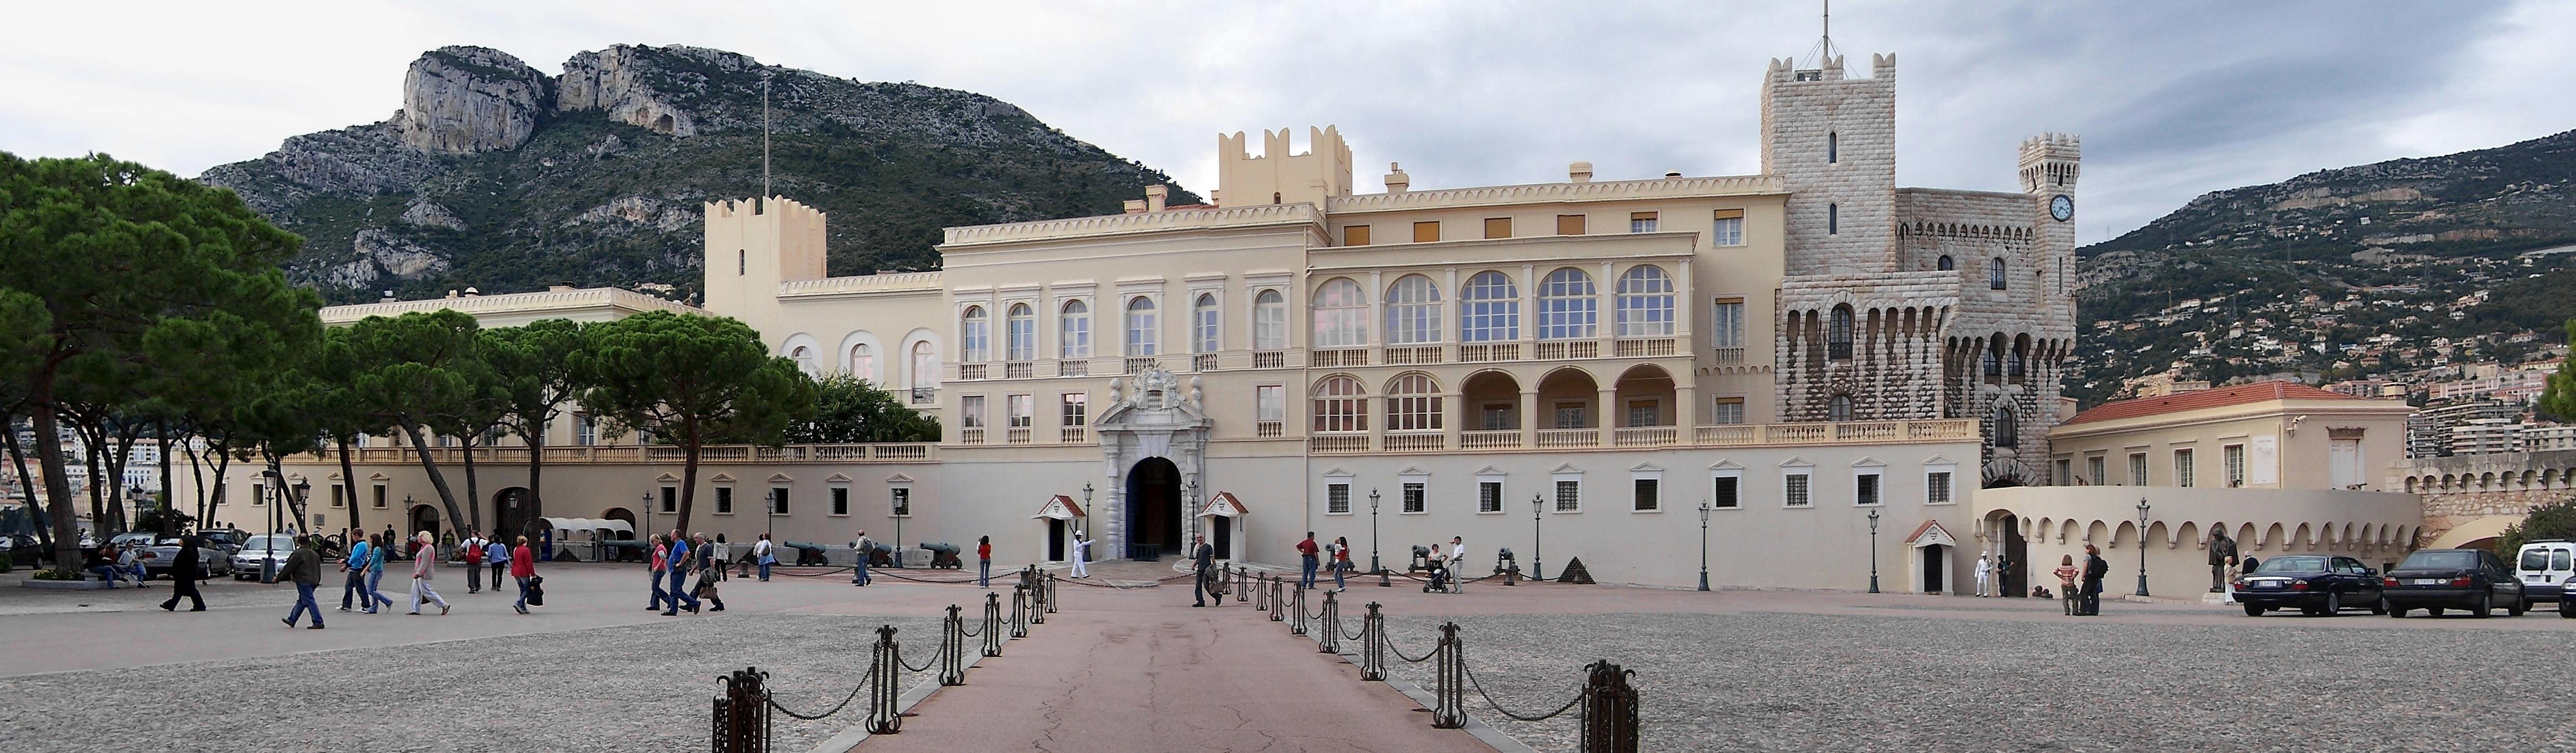 Charlene, Princess of Monaco - Wikipedia, the free